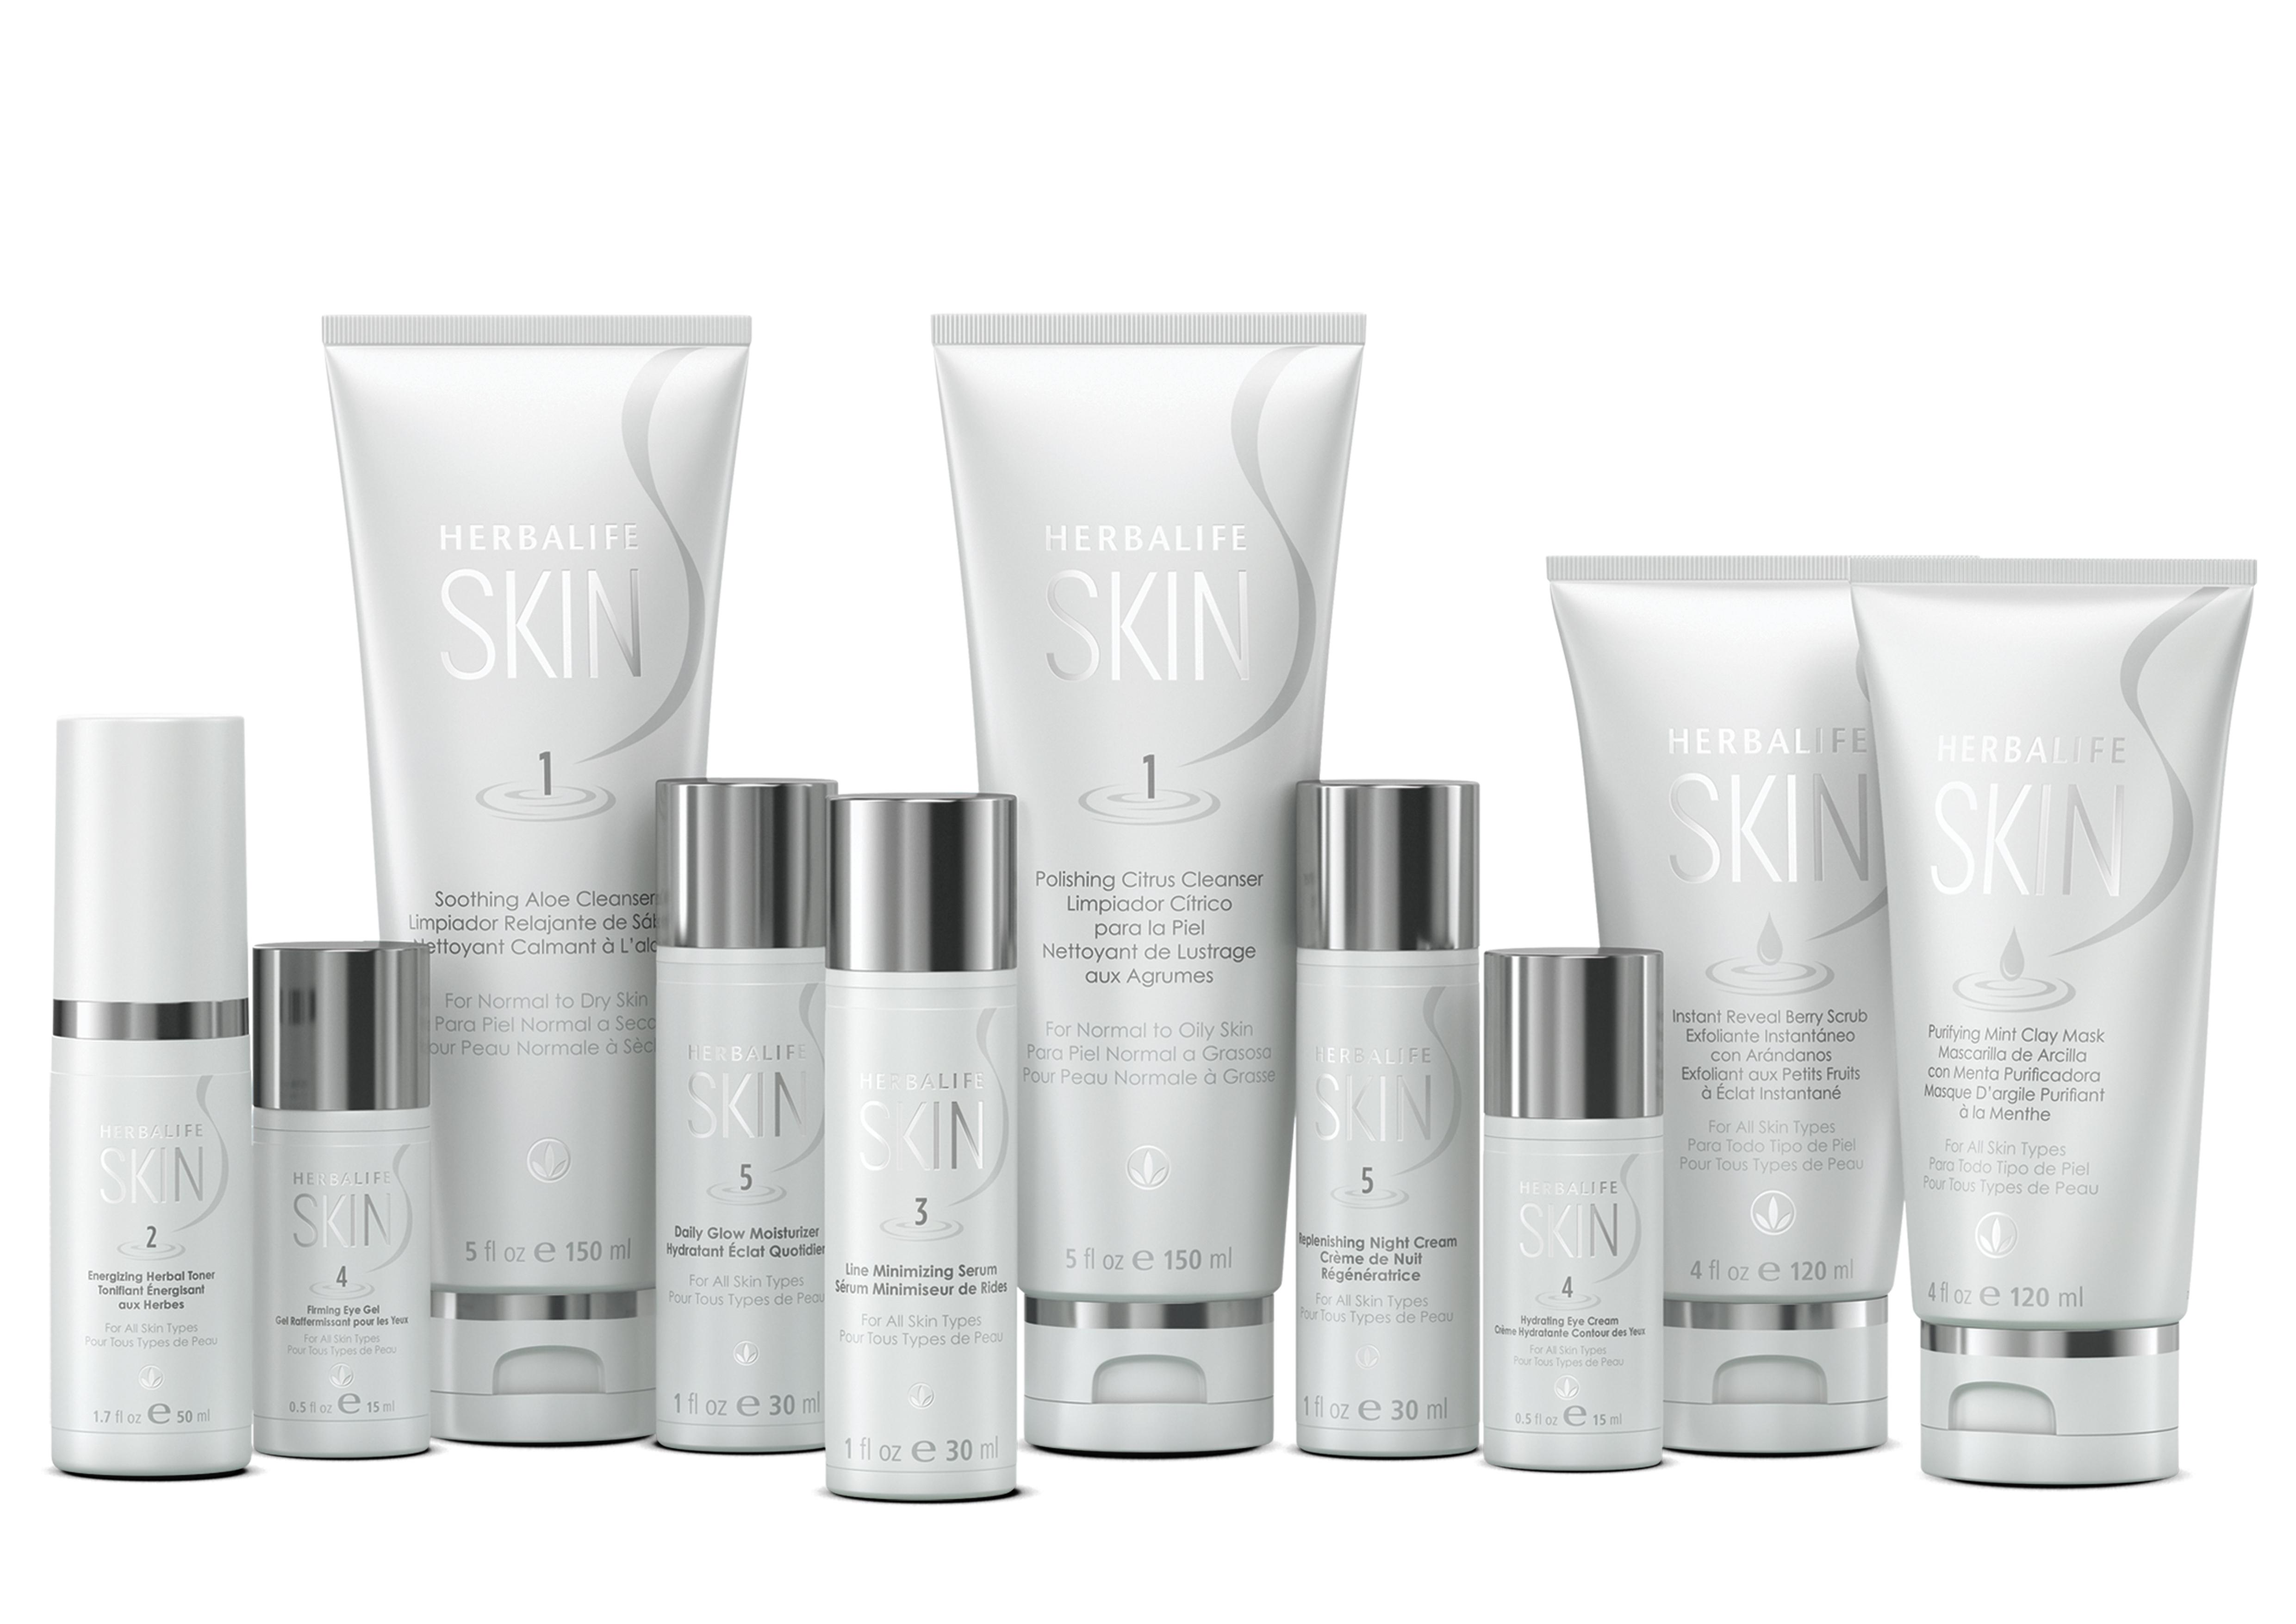 Care herbal life product skin - Herbalife Skin Www Stylecity In